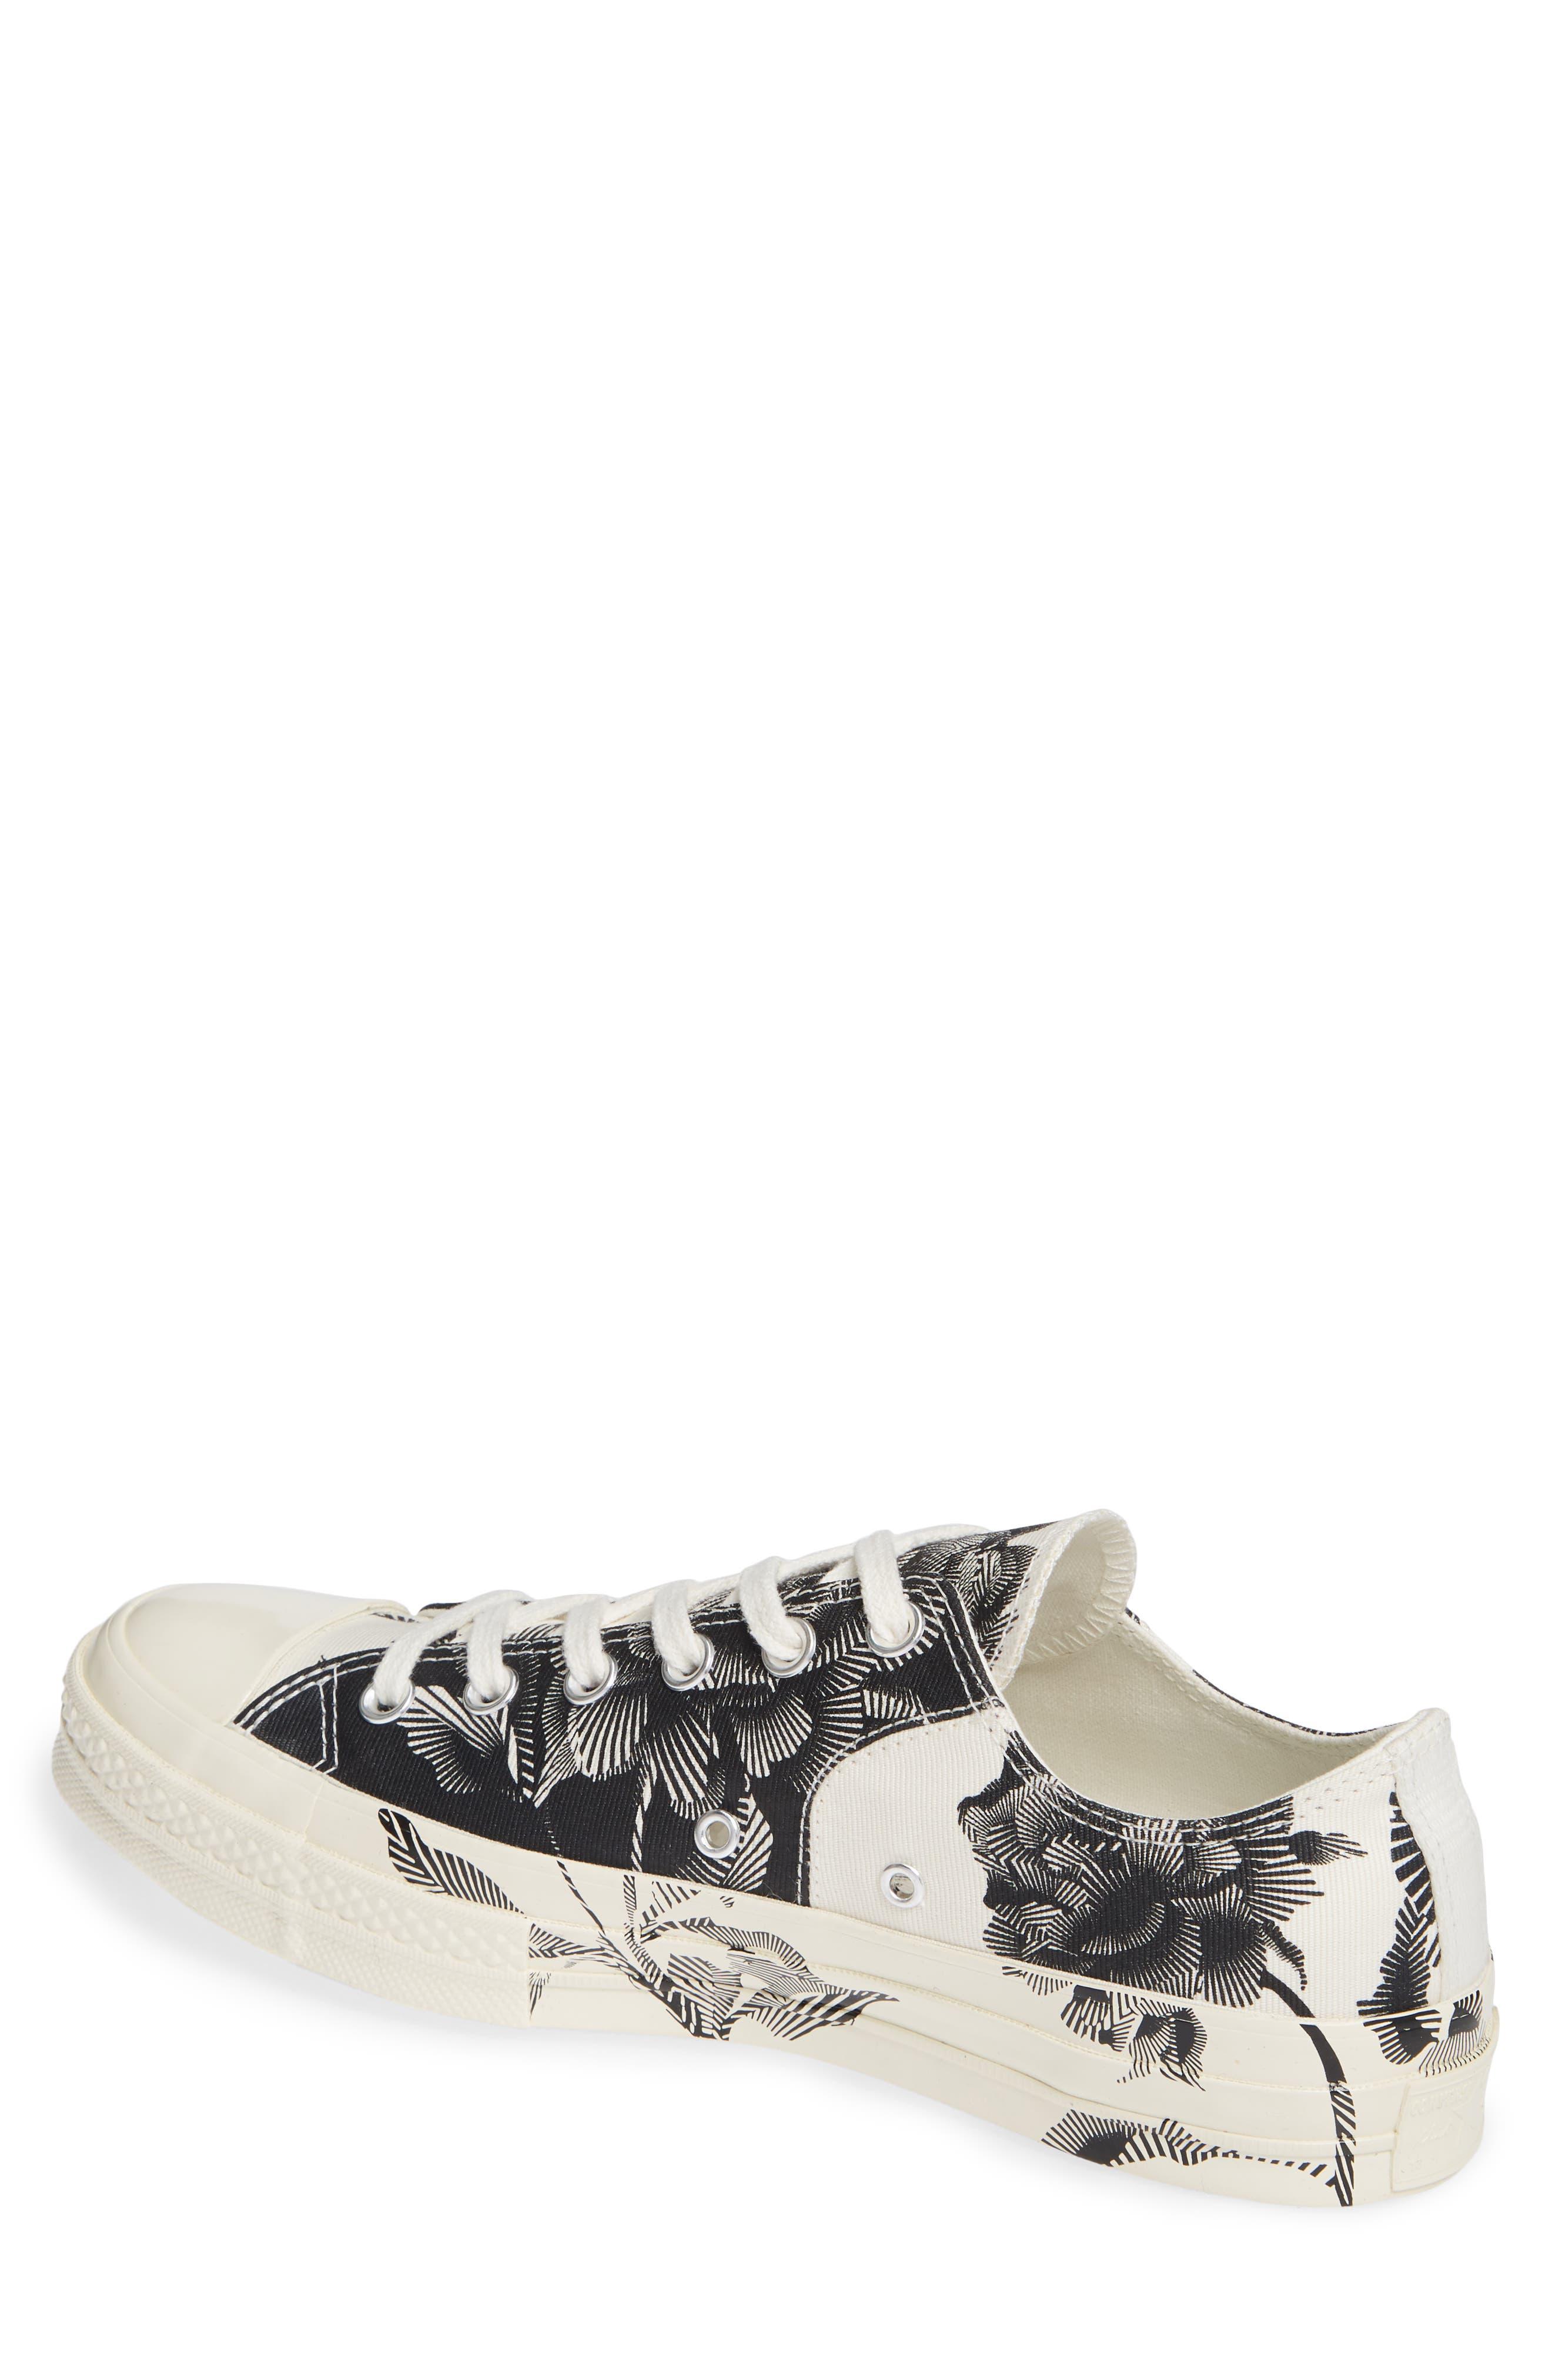 CT 70 Peony Low Top Sneaker,                             Alternate thumbnail 2, color,                             001